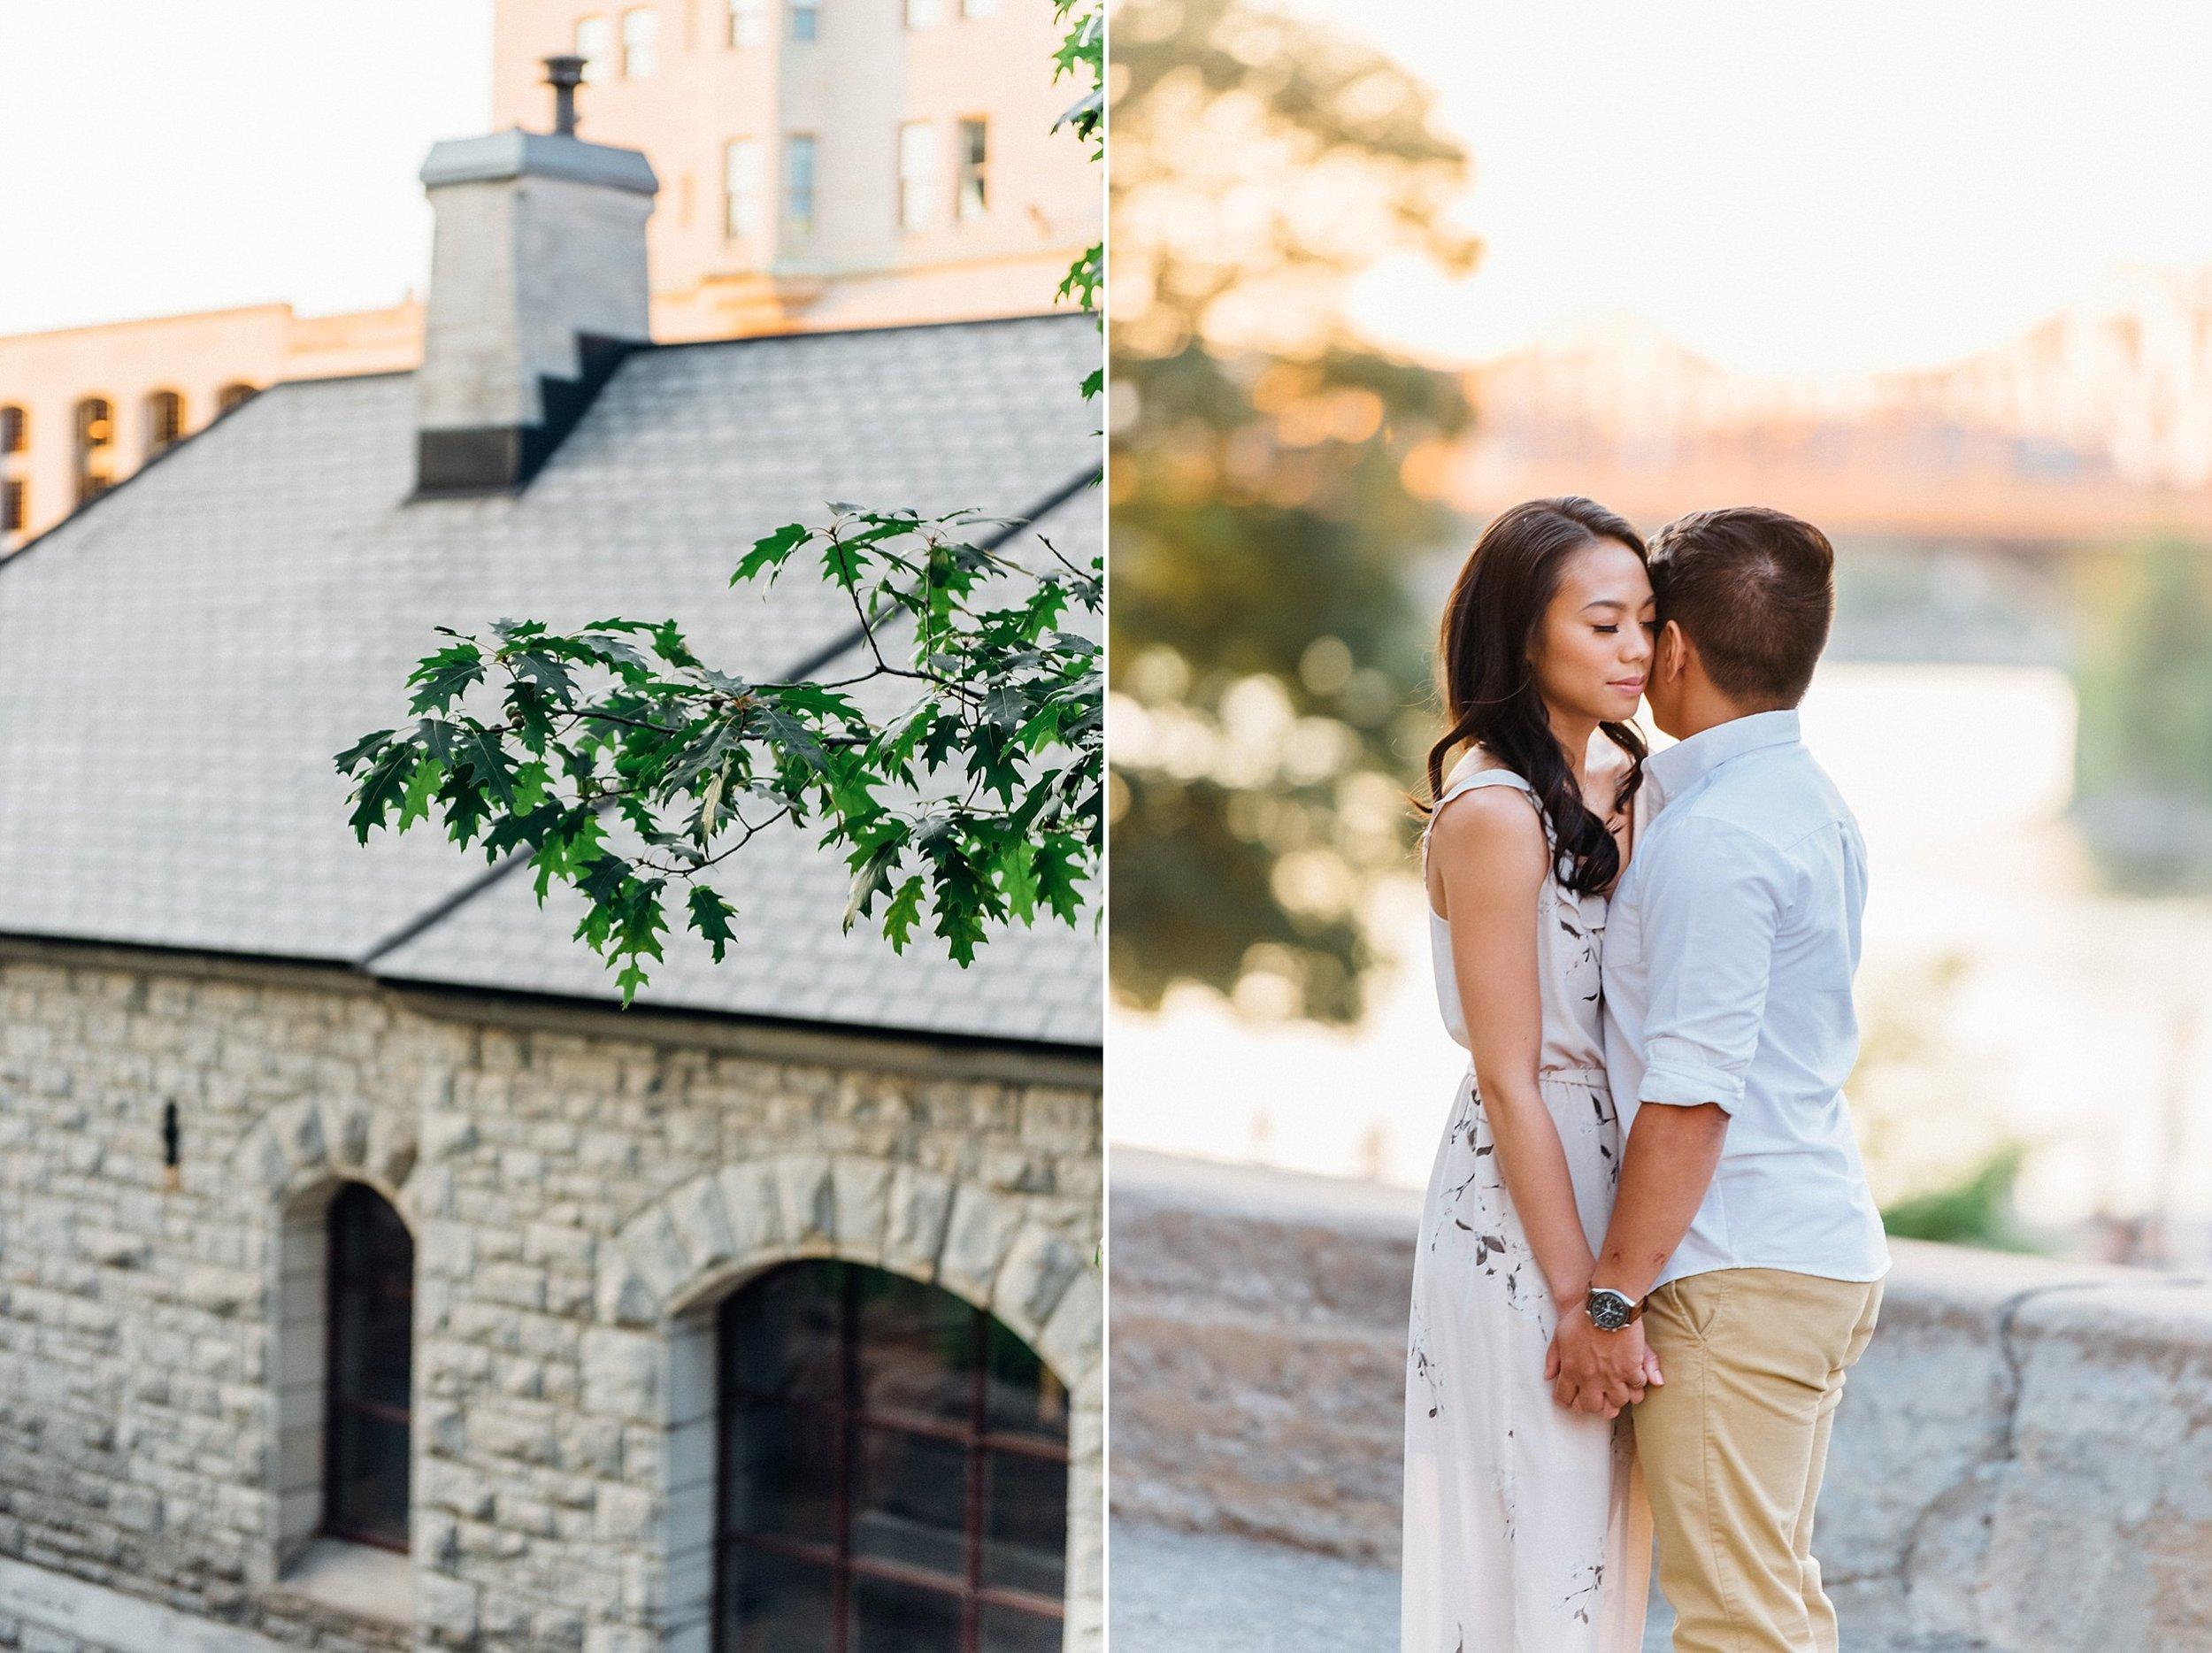 Ali and Batoul Photography - light, airy, indie documentary Ottawa wedding photographer_0297.jpg